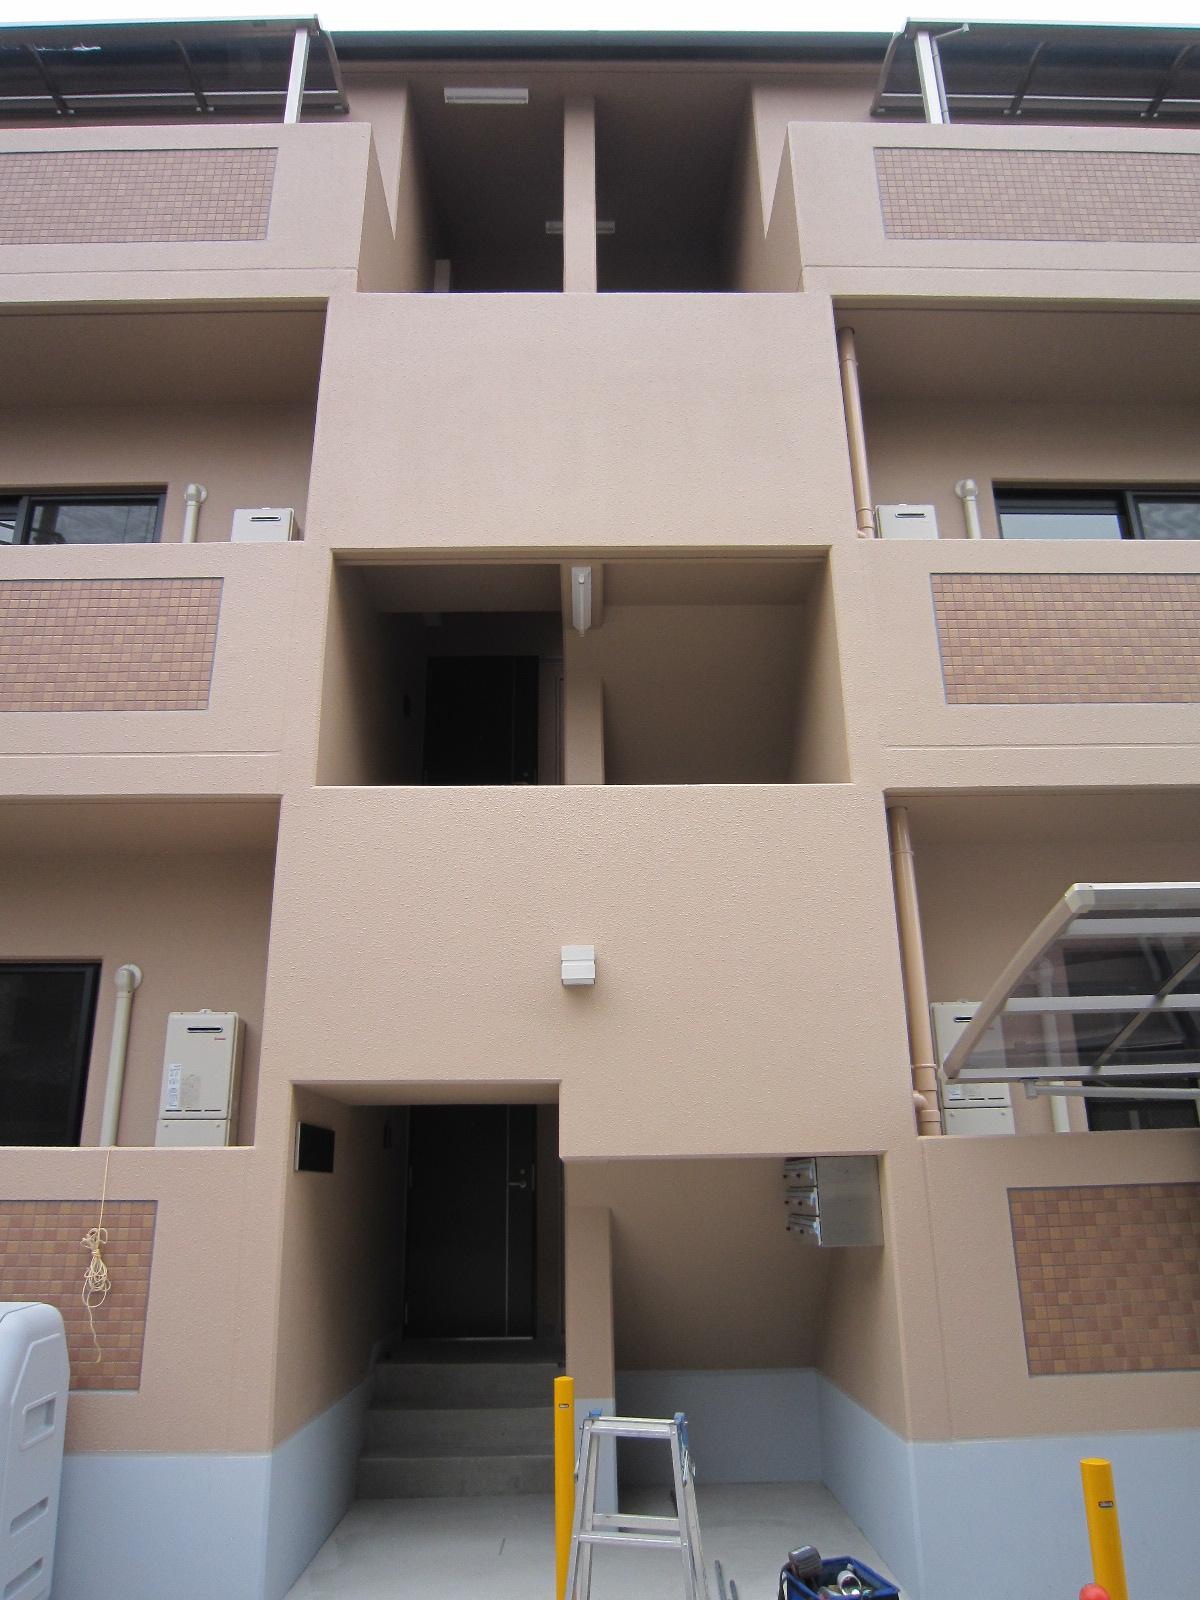 ≪新築≫Mon Amour Mimurodo(2012年3月竣工)